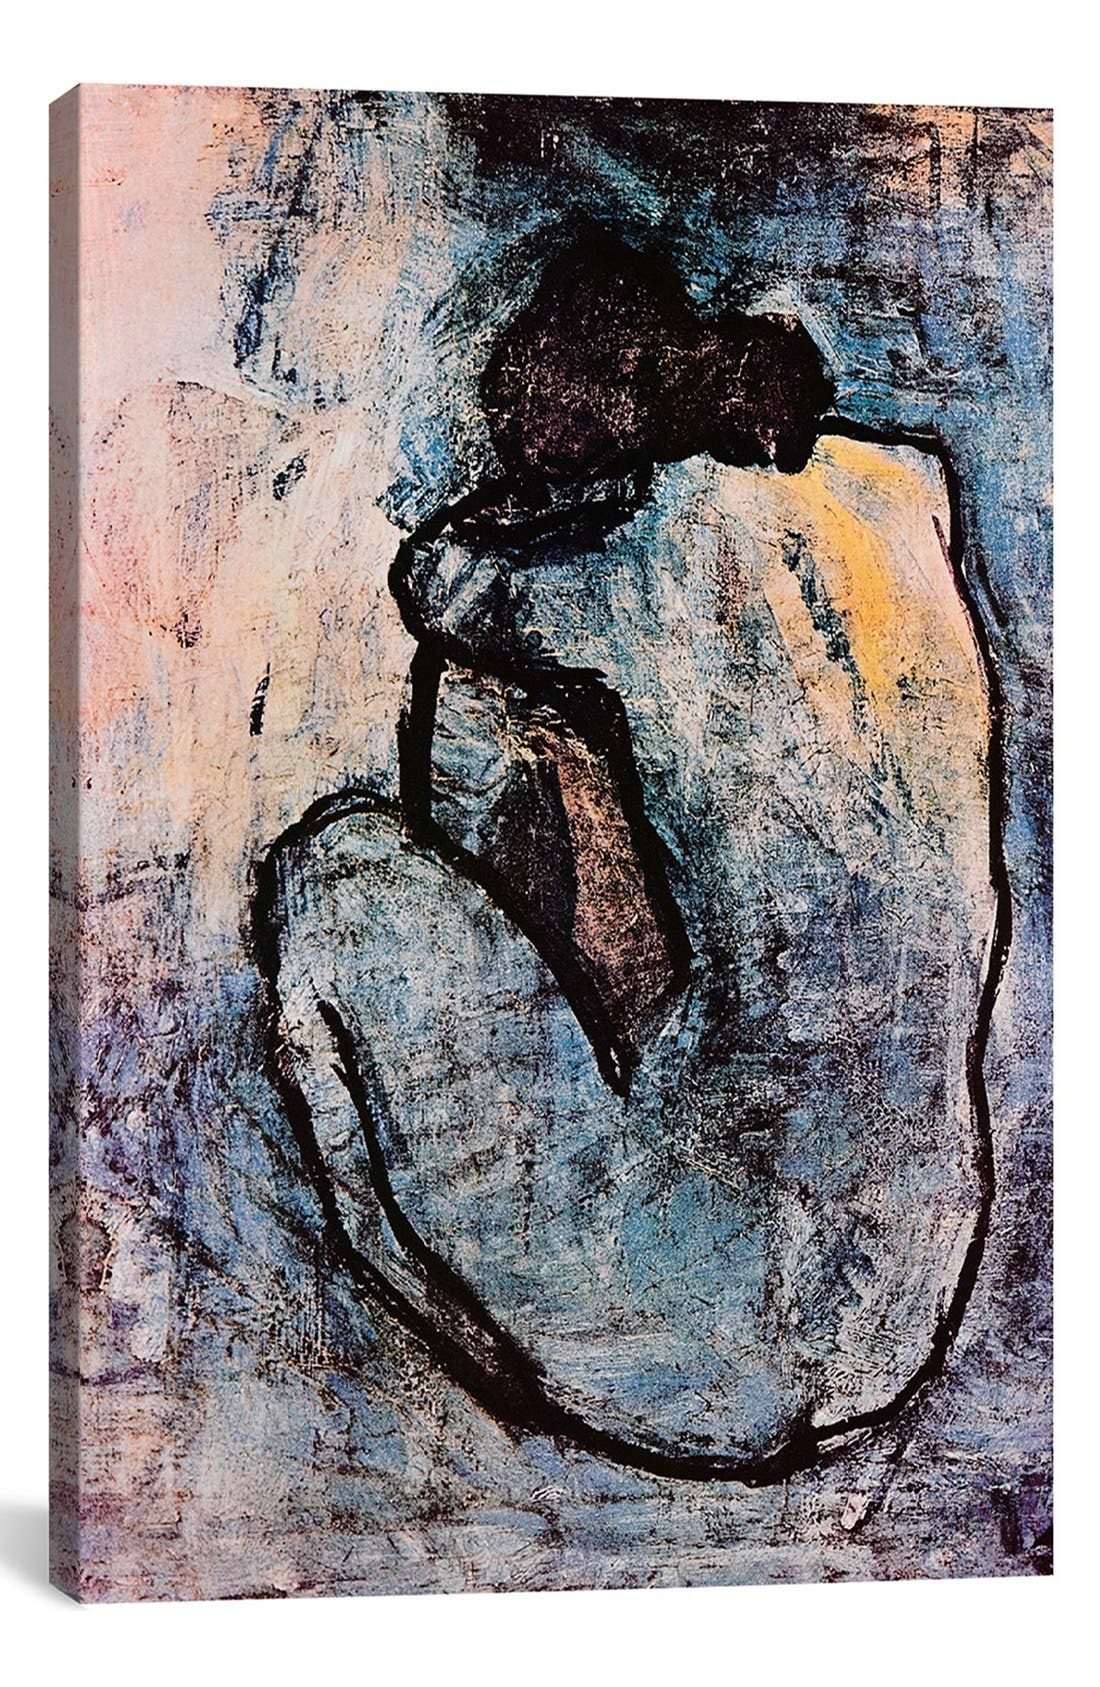 Alternate Image 1 Selected - iCanvas 'Blue Nude - Pablo Picasso' Giclée Print Canvas Art